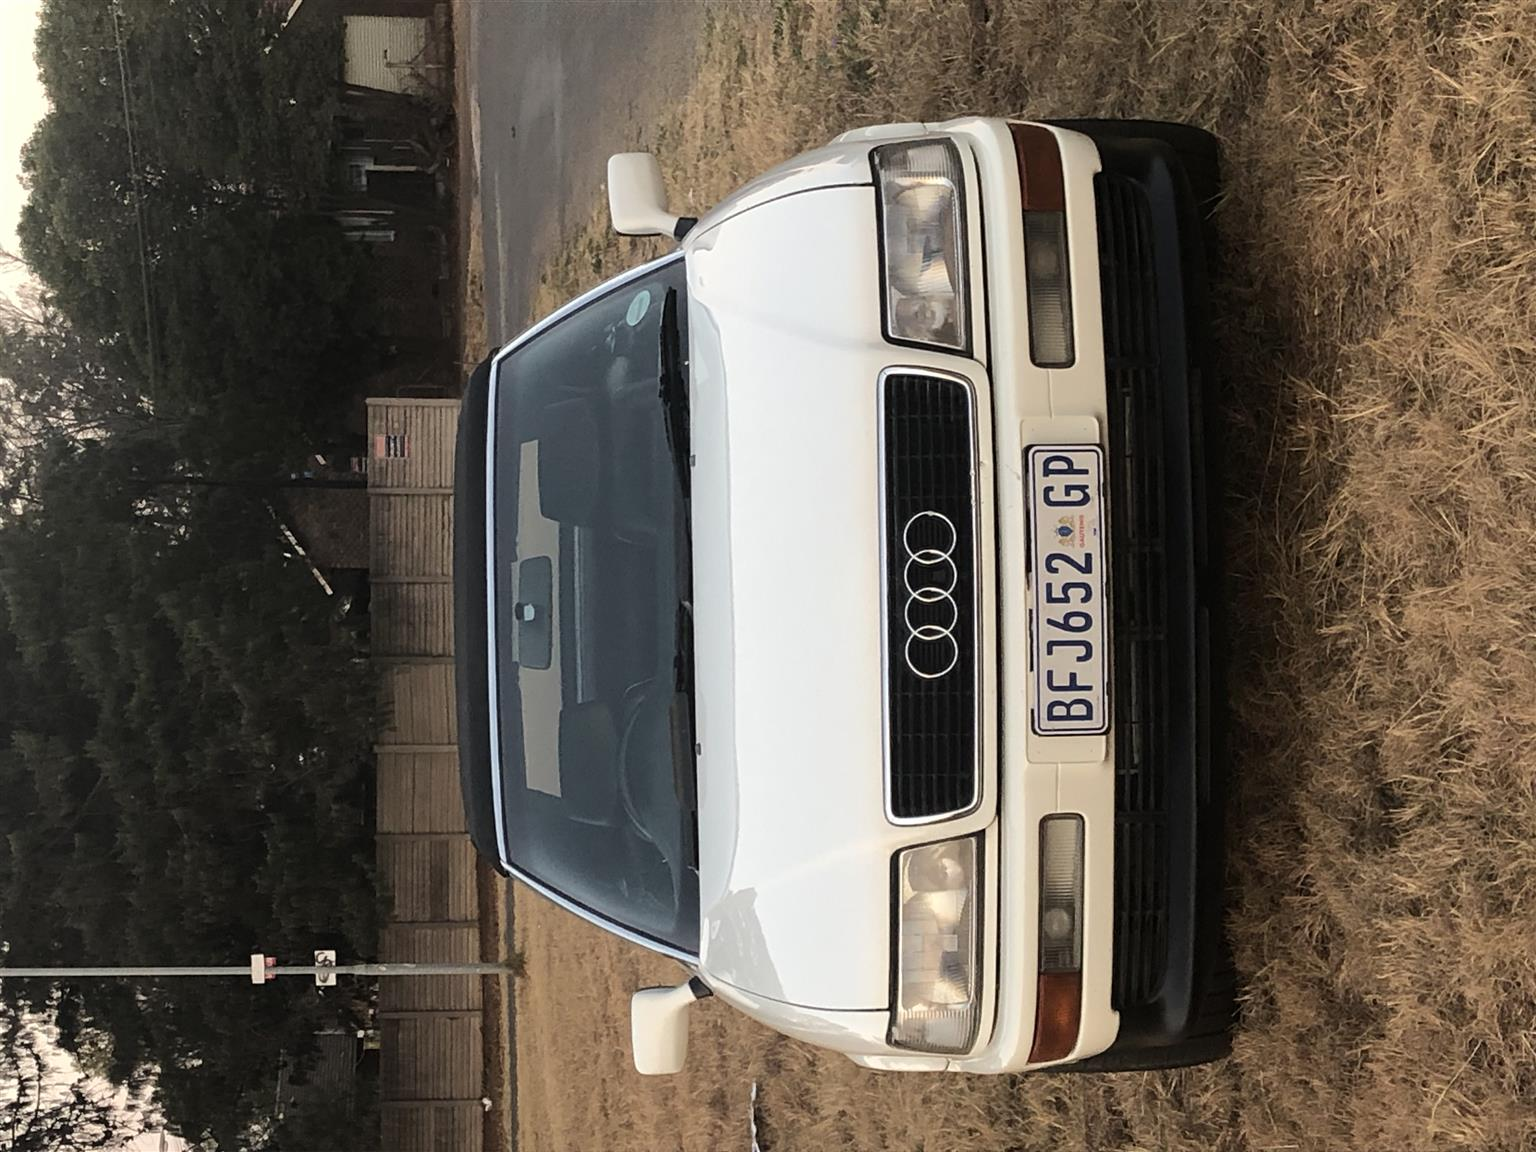 1997 Audi A4 3.0 cabriolet